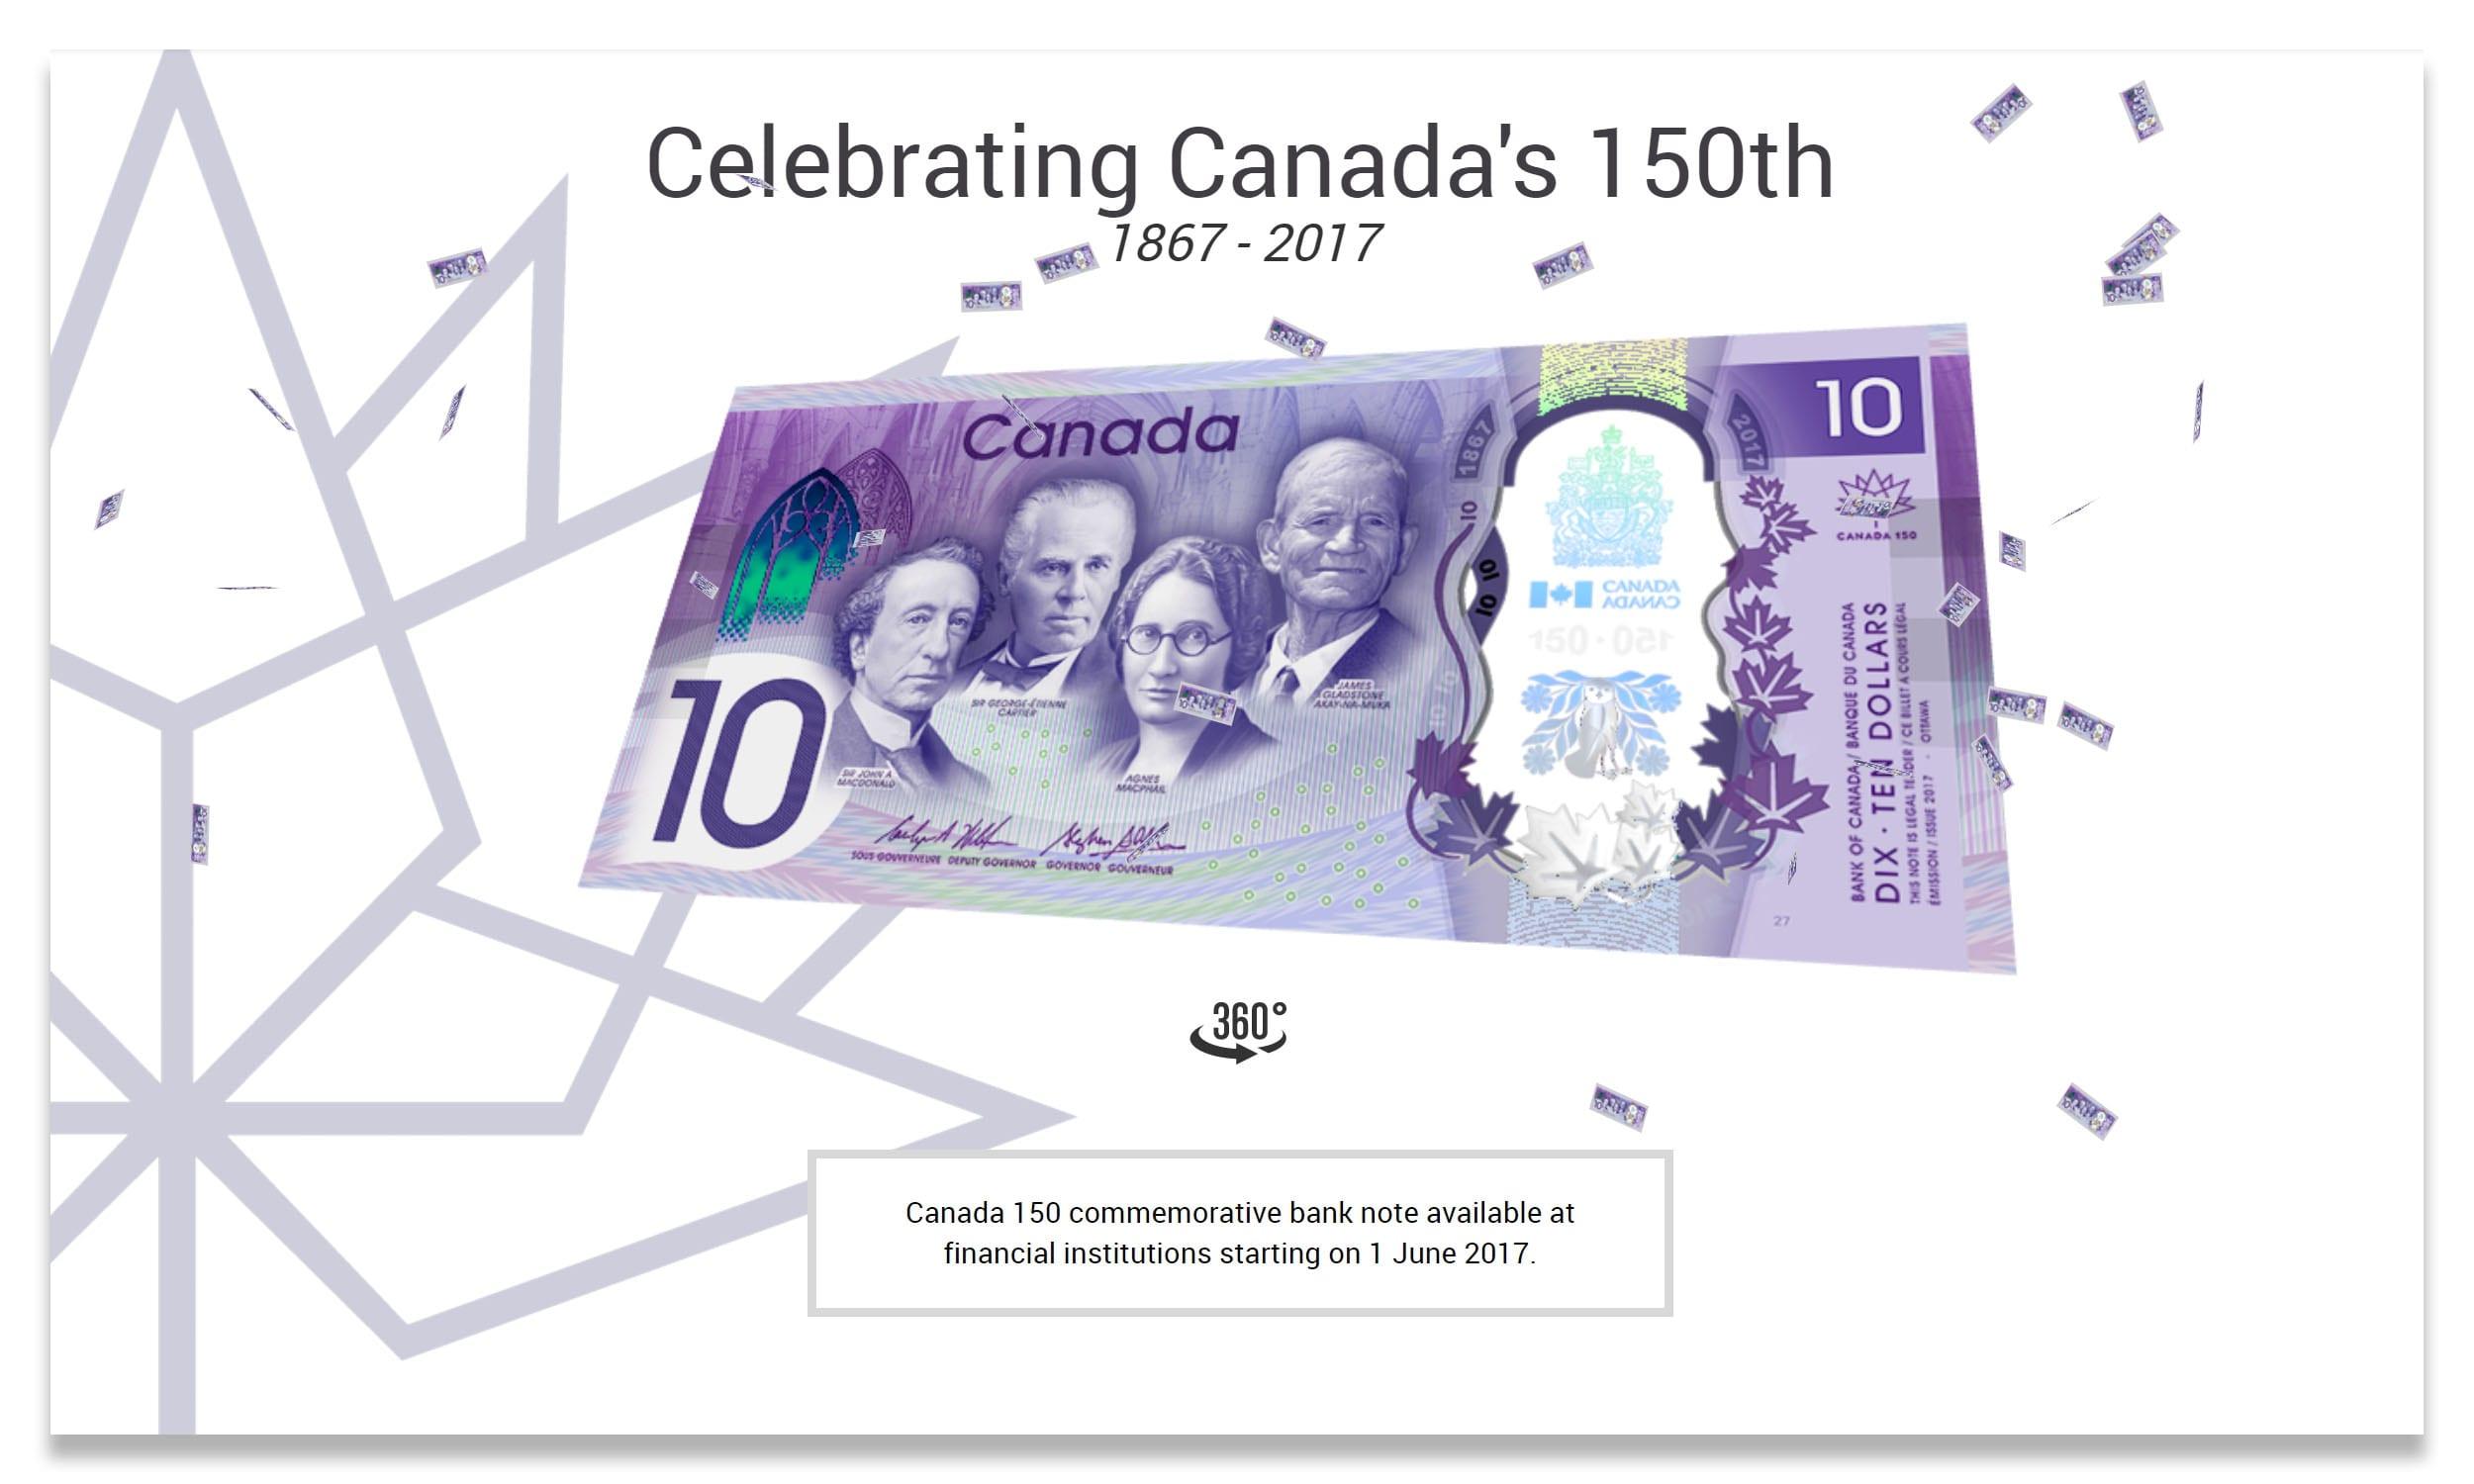 Canada hid the Konami Code in its commemorative $10 bill launch